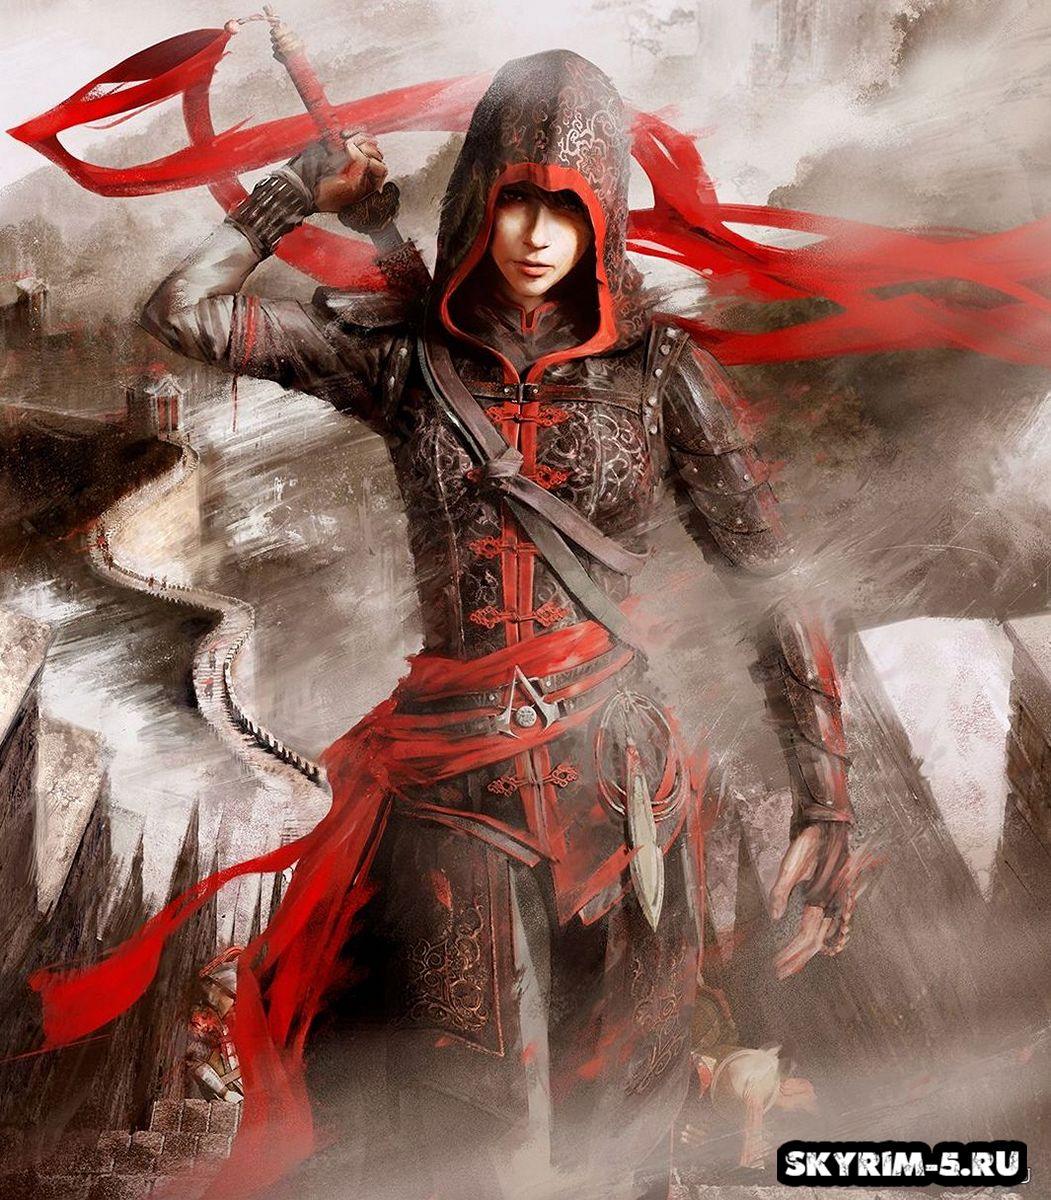 Шао Юн - Assassin's CreedМоды Скайрим > Броня и одежда Скайрим